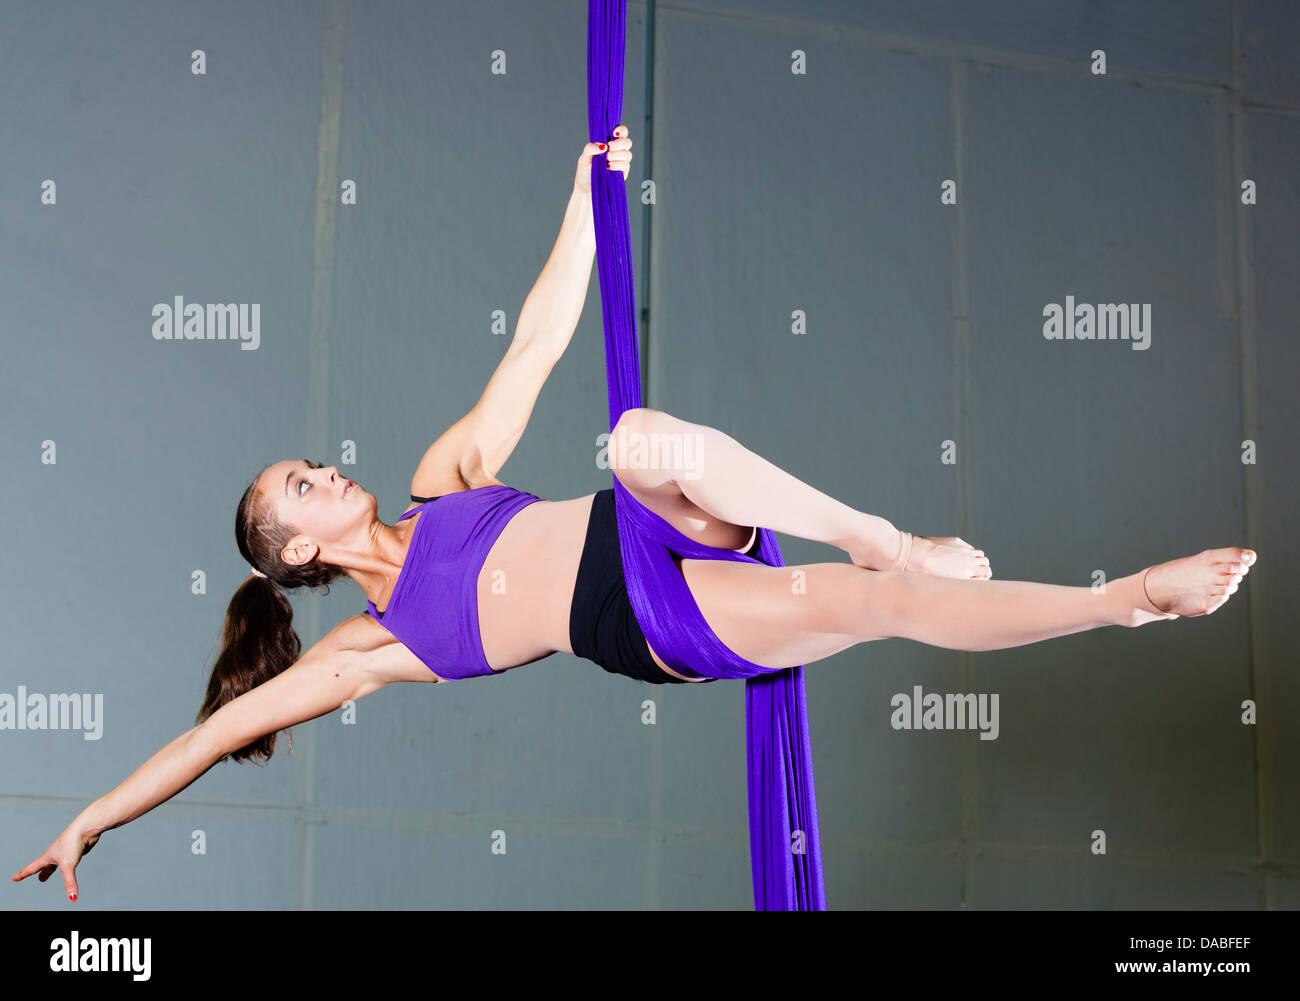 Gymnast - Stock Image